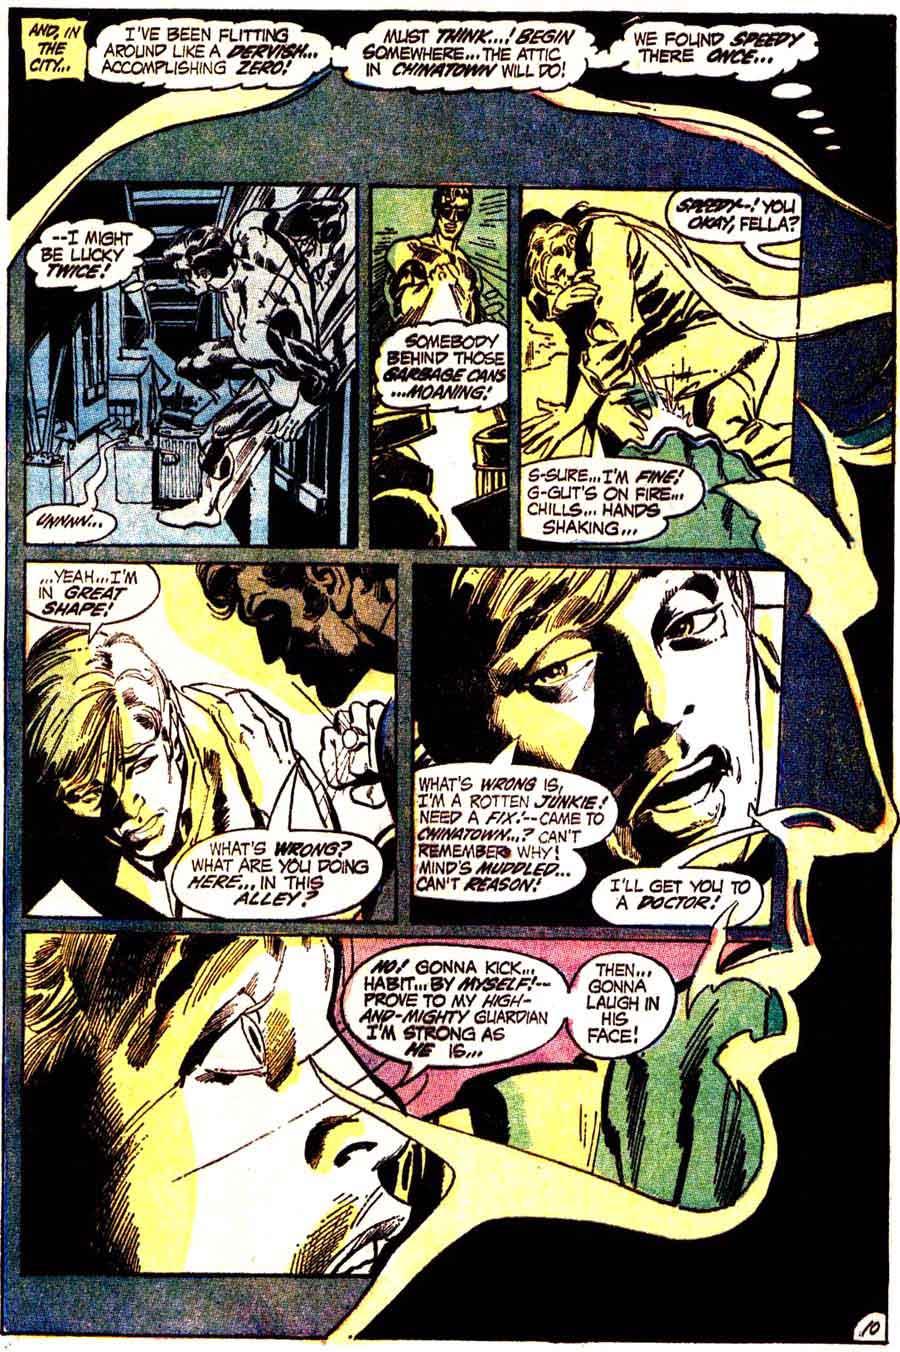 Green Lantern Green Arrow #86 dc comic book page art by Neal Adams